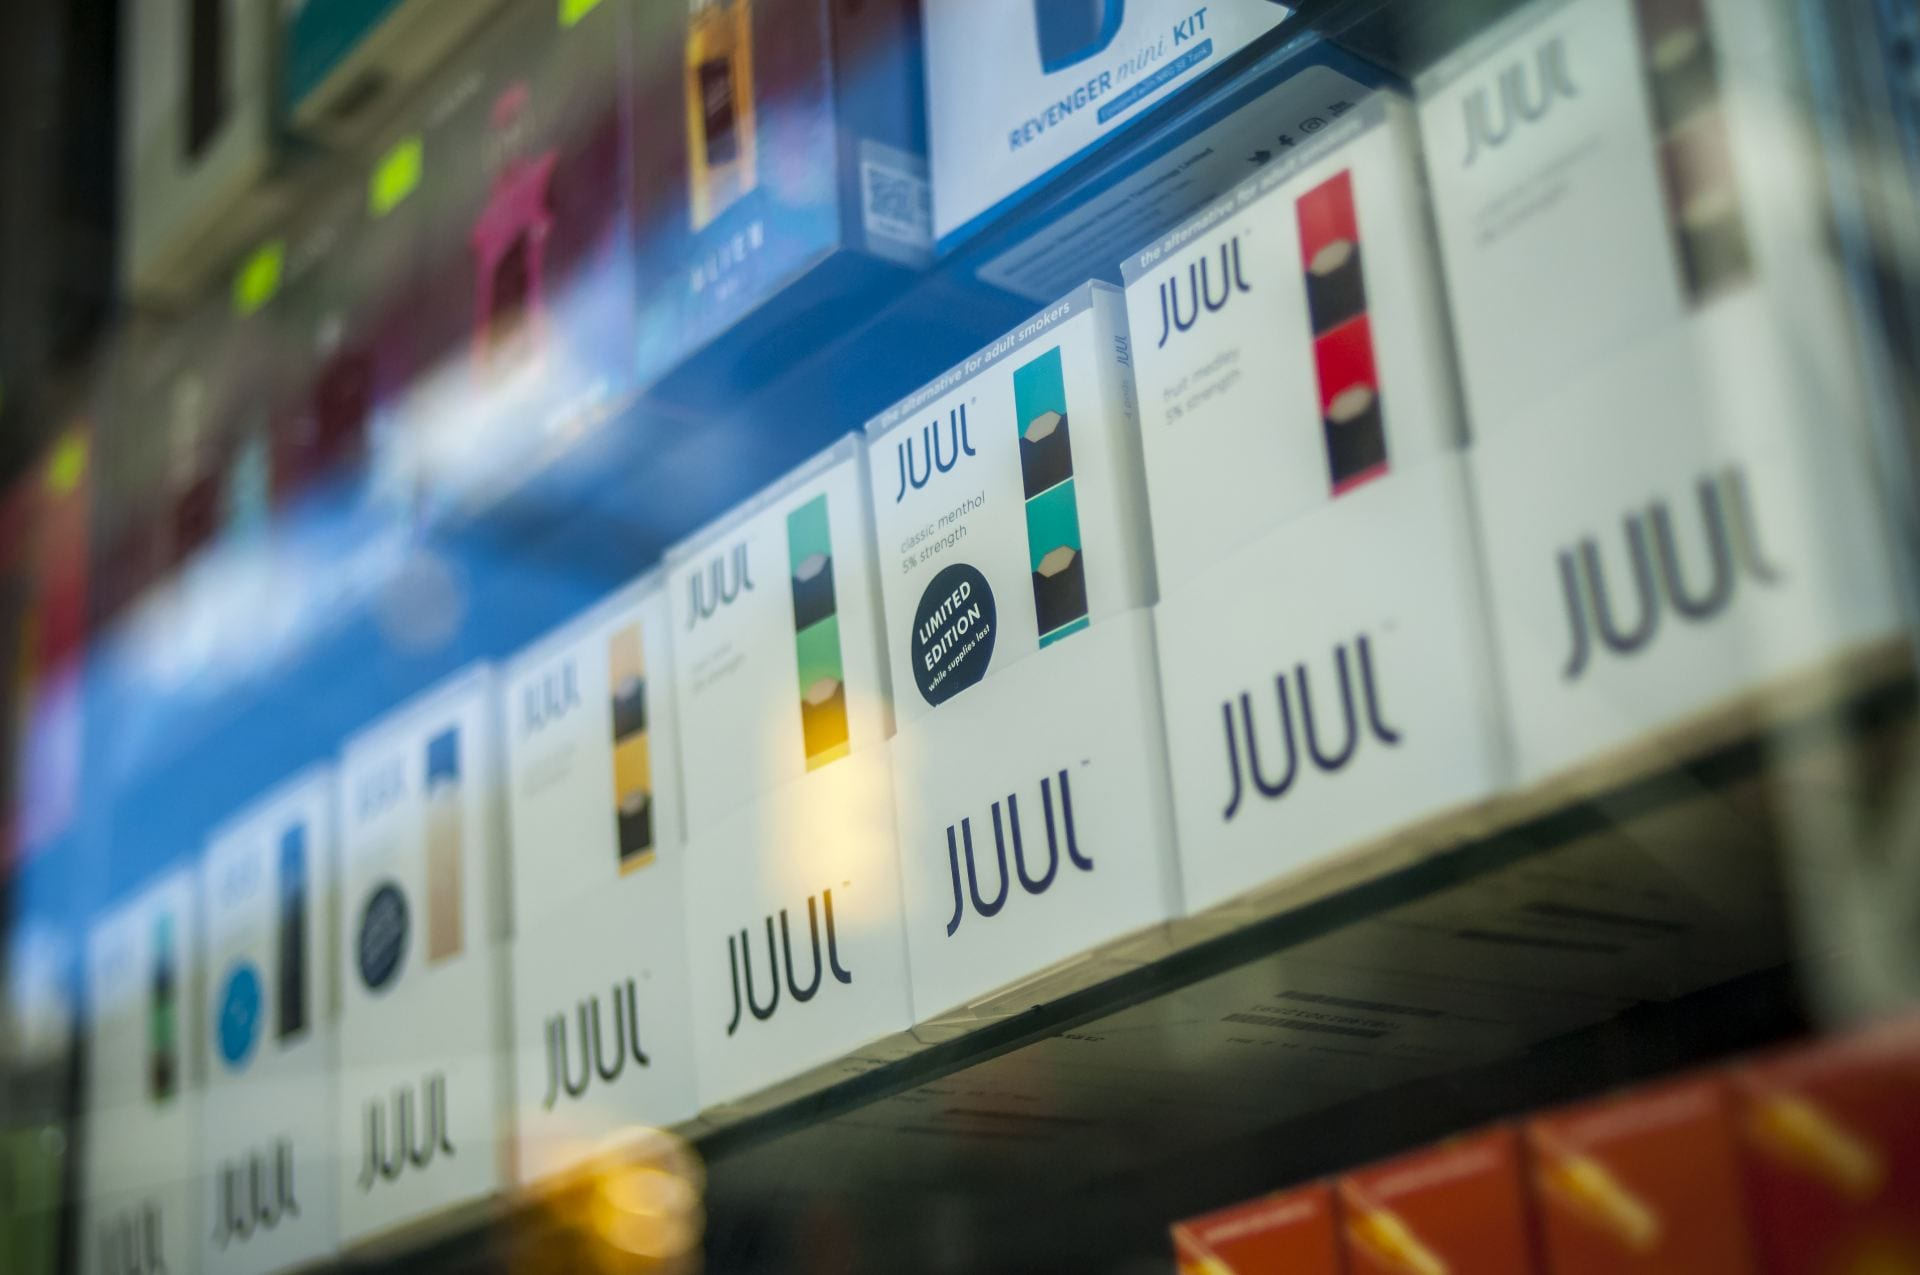 Safe smoking alternative e-cigarette revealed as dangerous